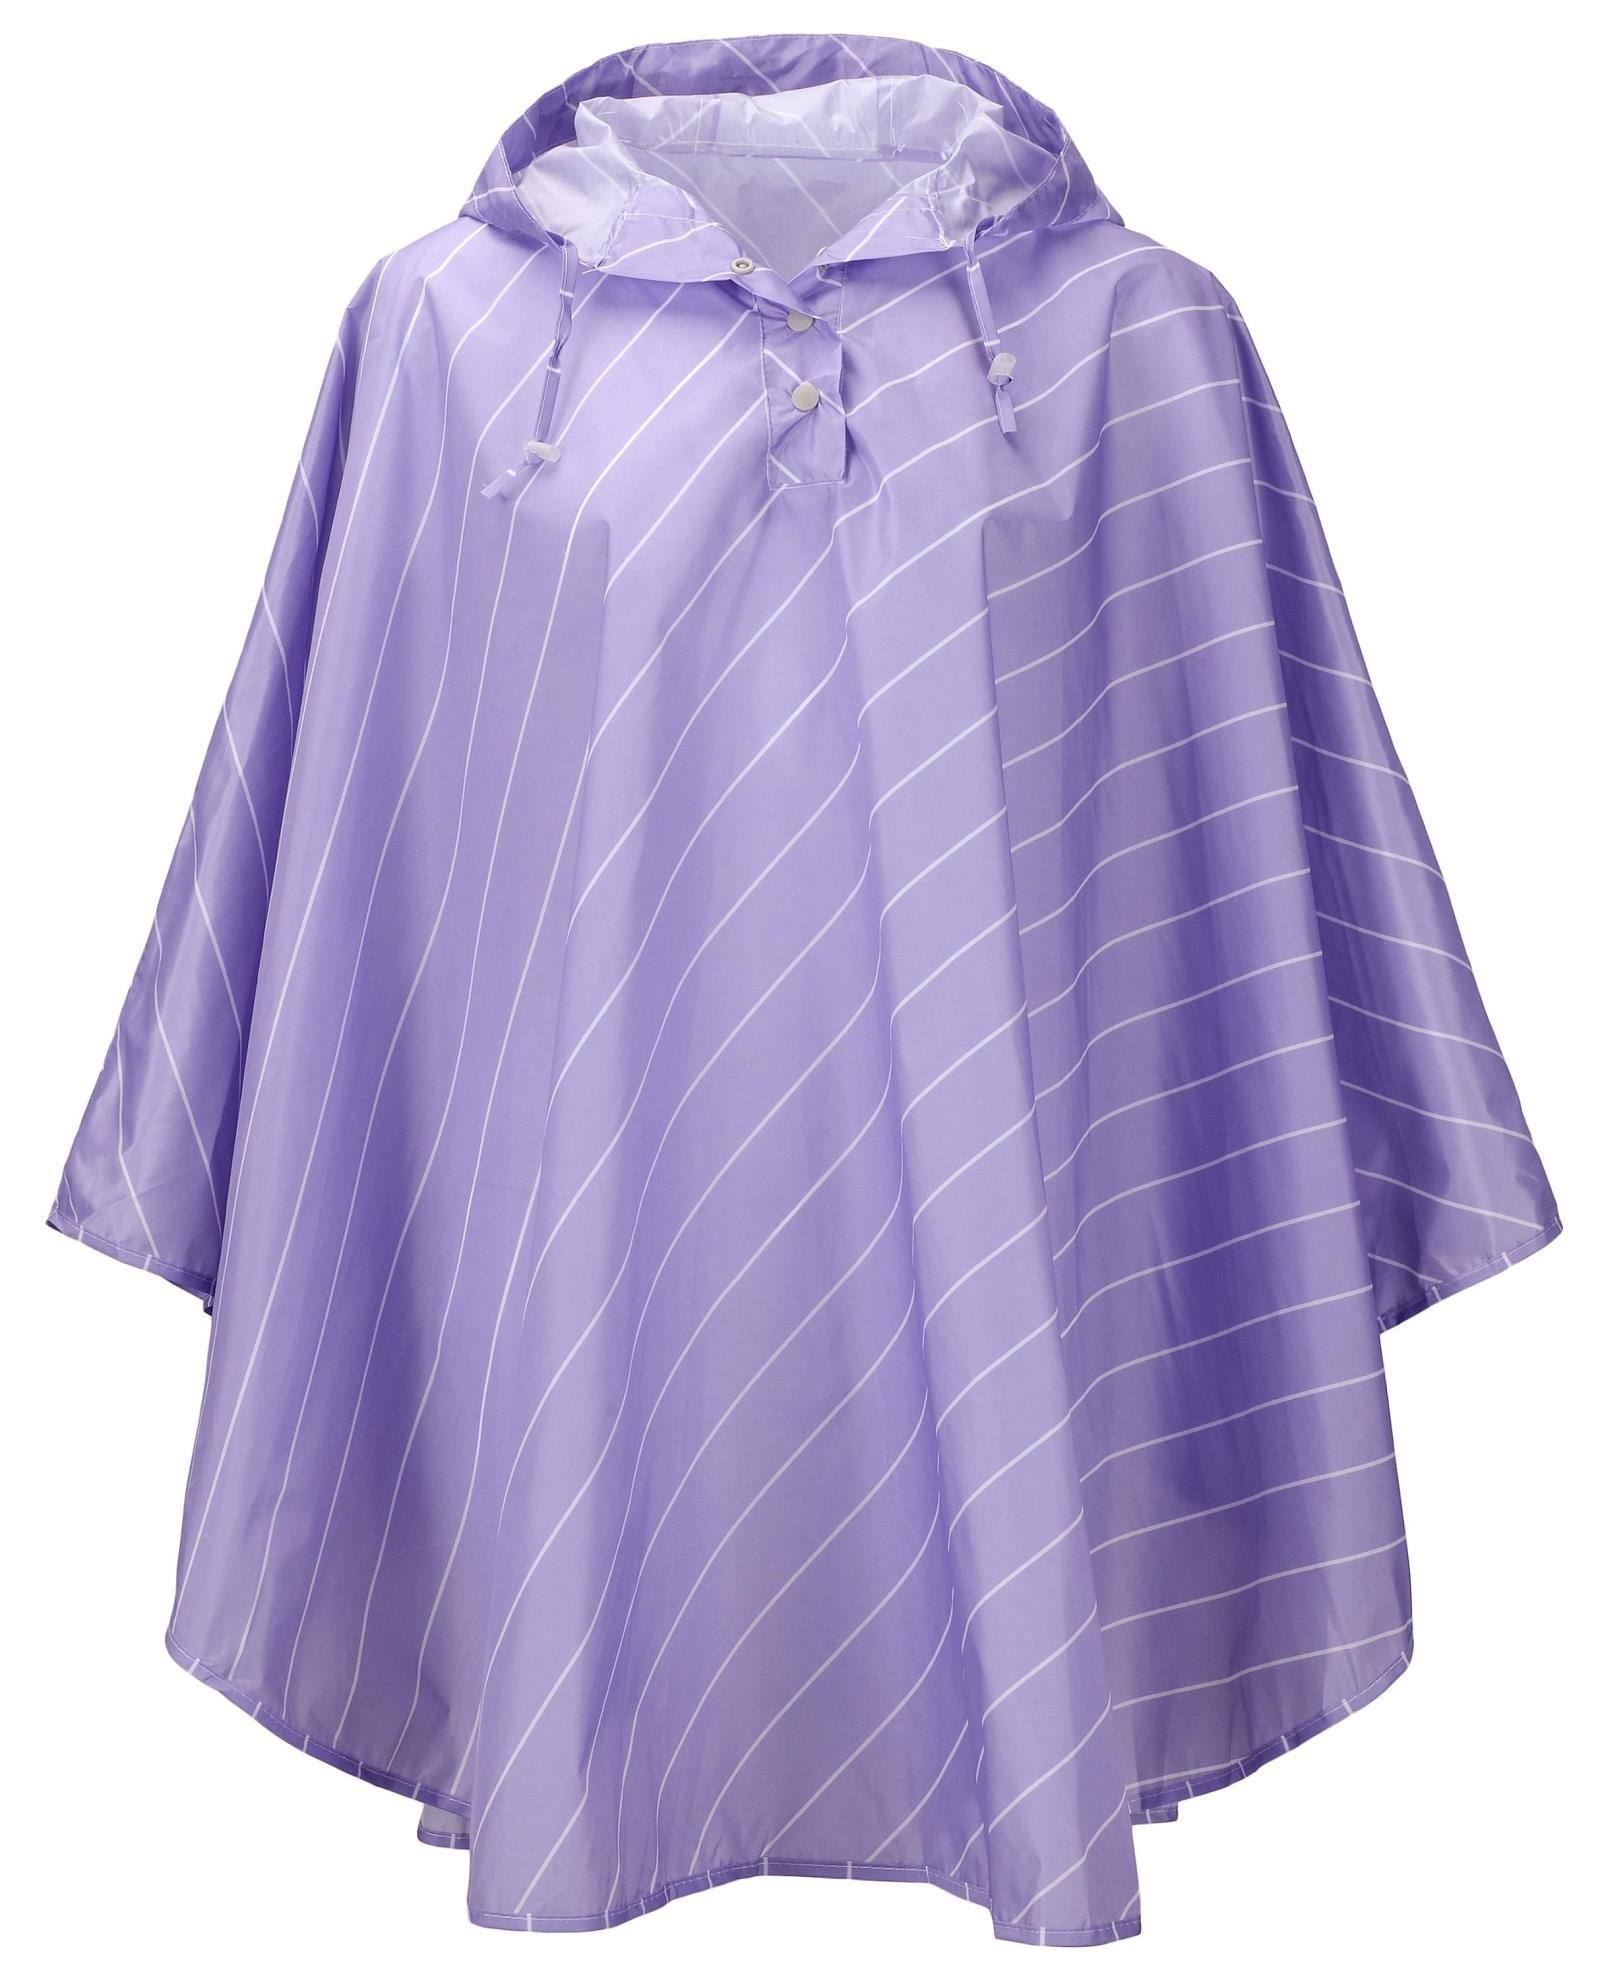 QZUnique Women's Lightweight Outdoor Ripstop Waterproof Packable Rain Jacket Stripes Poncho Raincoat with Hood Purple